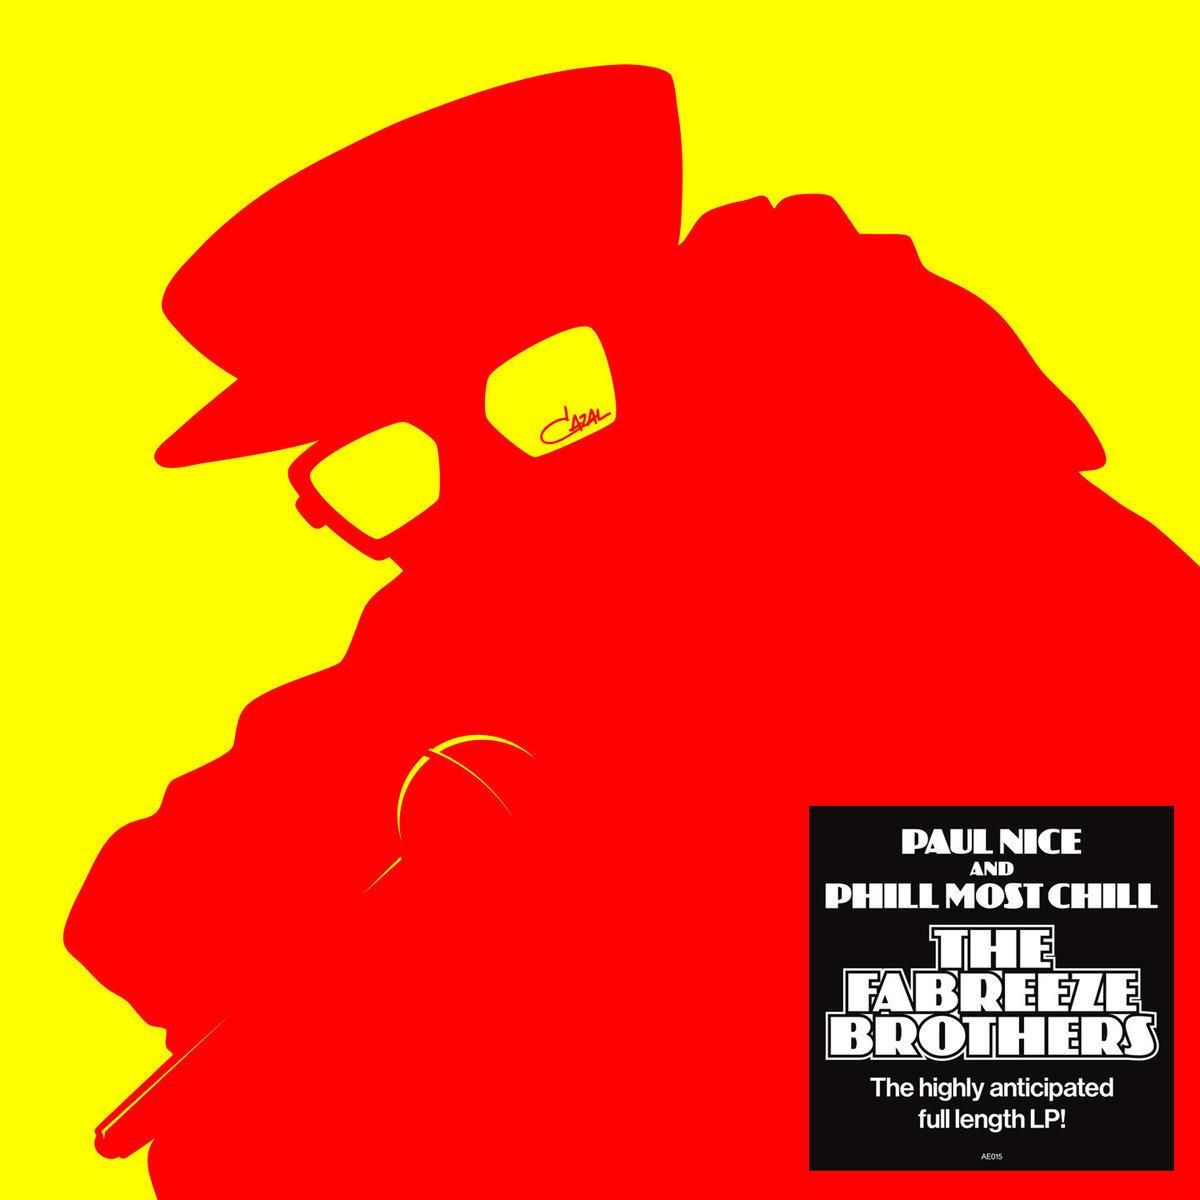 Fabreeze Brothers | Paul Nice / Sureshot digital